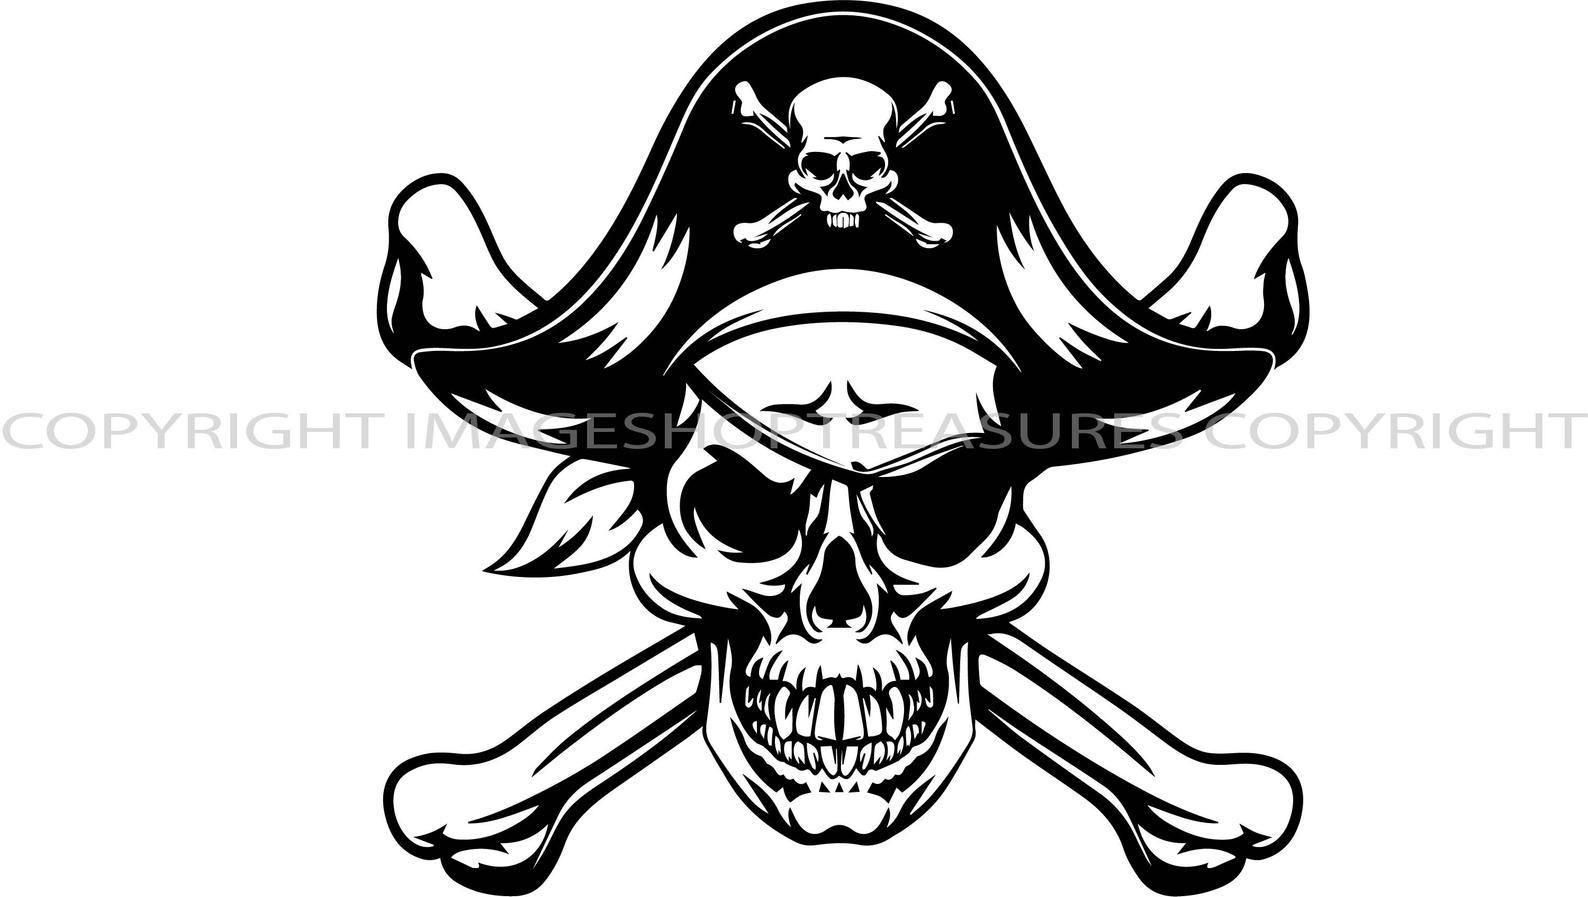 Pirate Skull Flag Sailor Cap Crossbone Sword Piracy Ship Bones Etsy Pirate Skull Pirate Tattoo Pirate Images